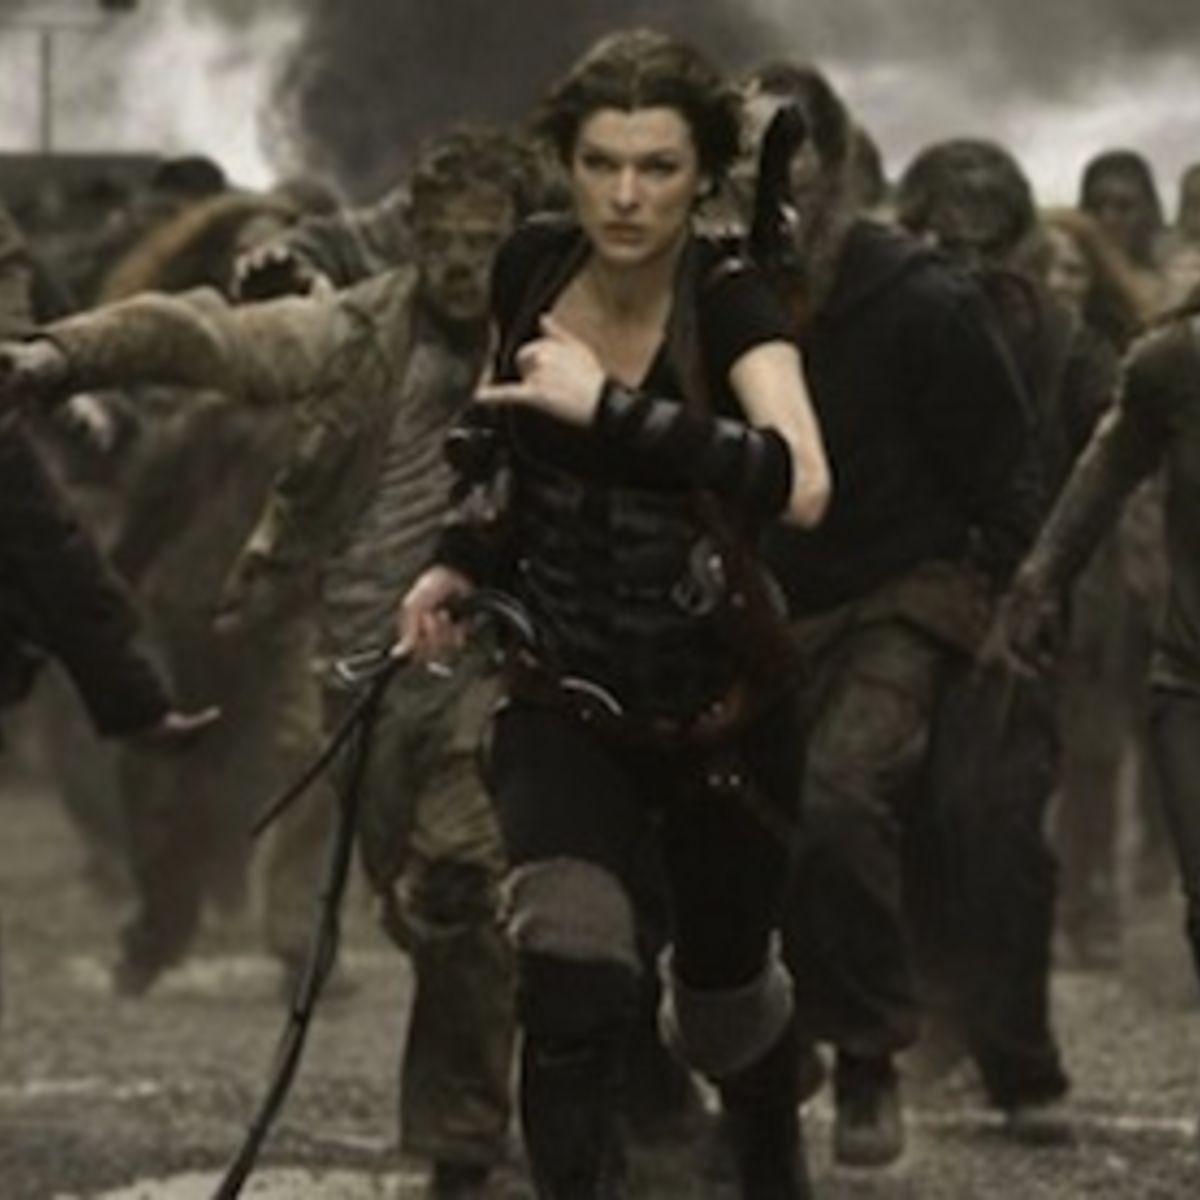 resident-evil-alice-zombies.jpg